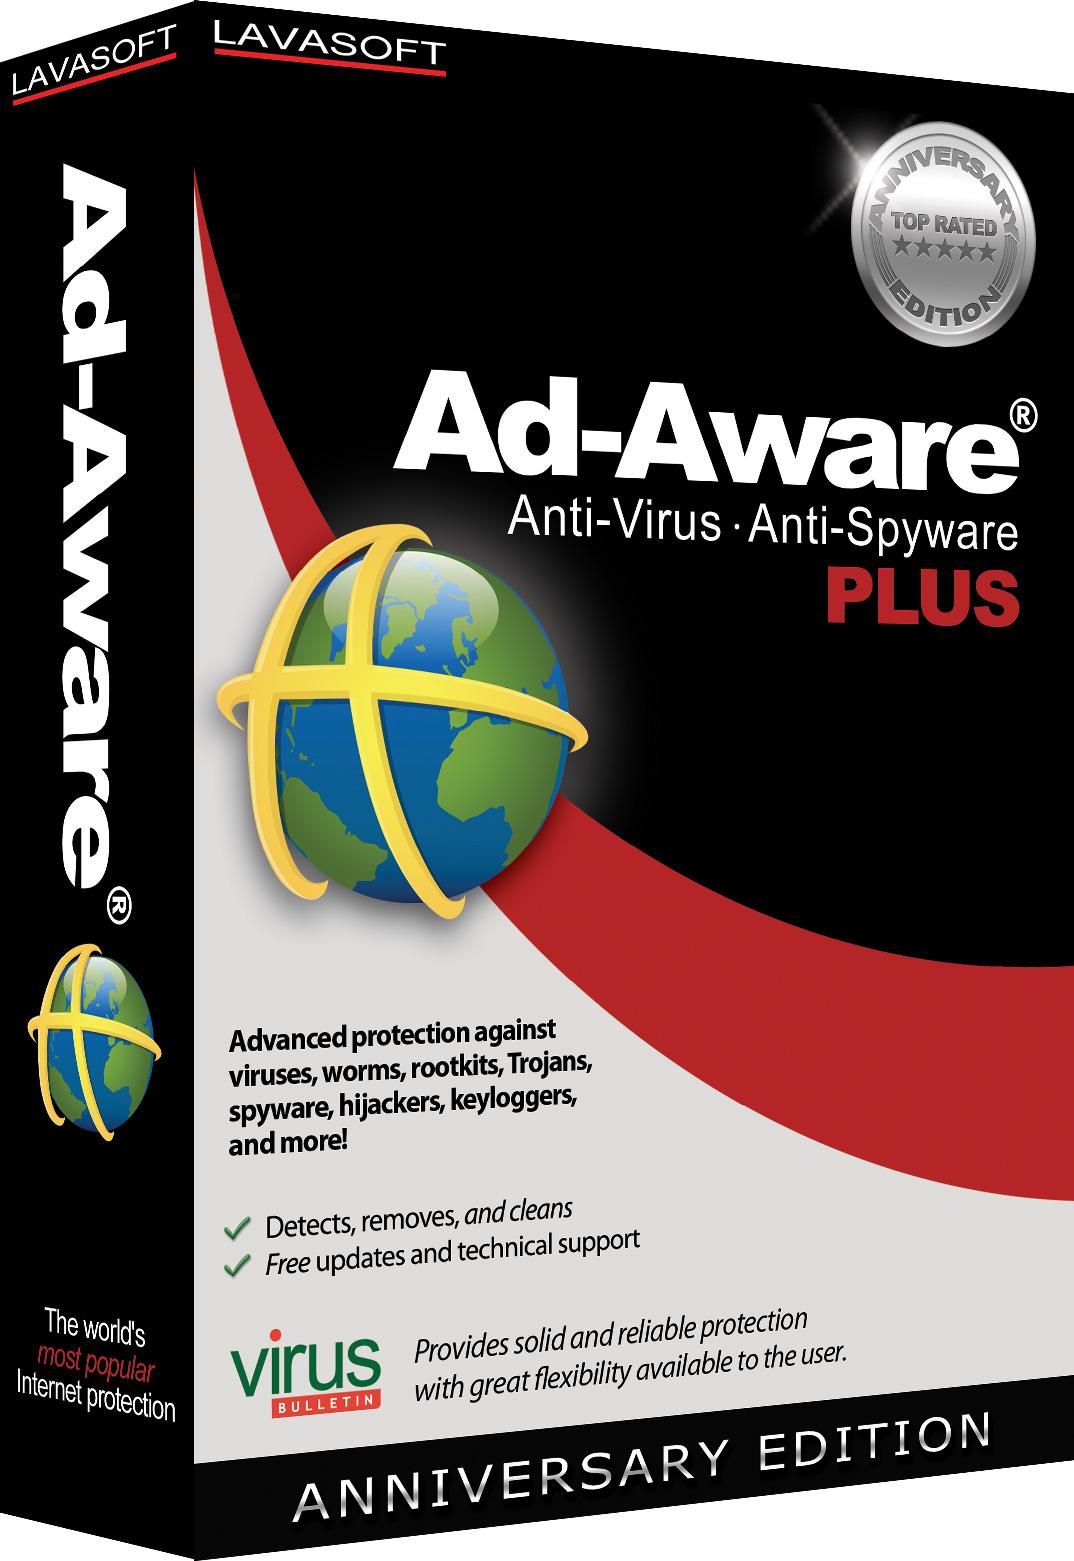 Ad-aware Standard Edition 6.0